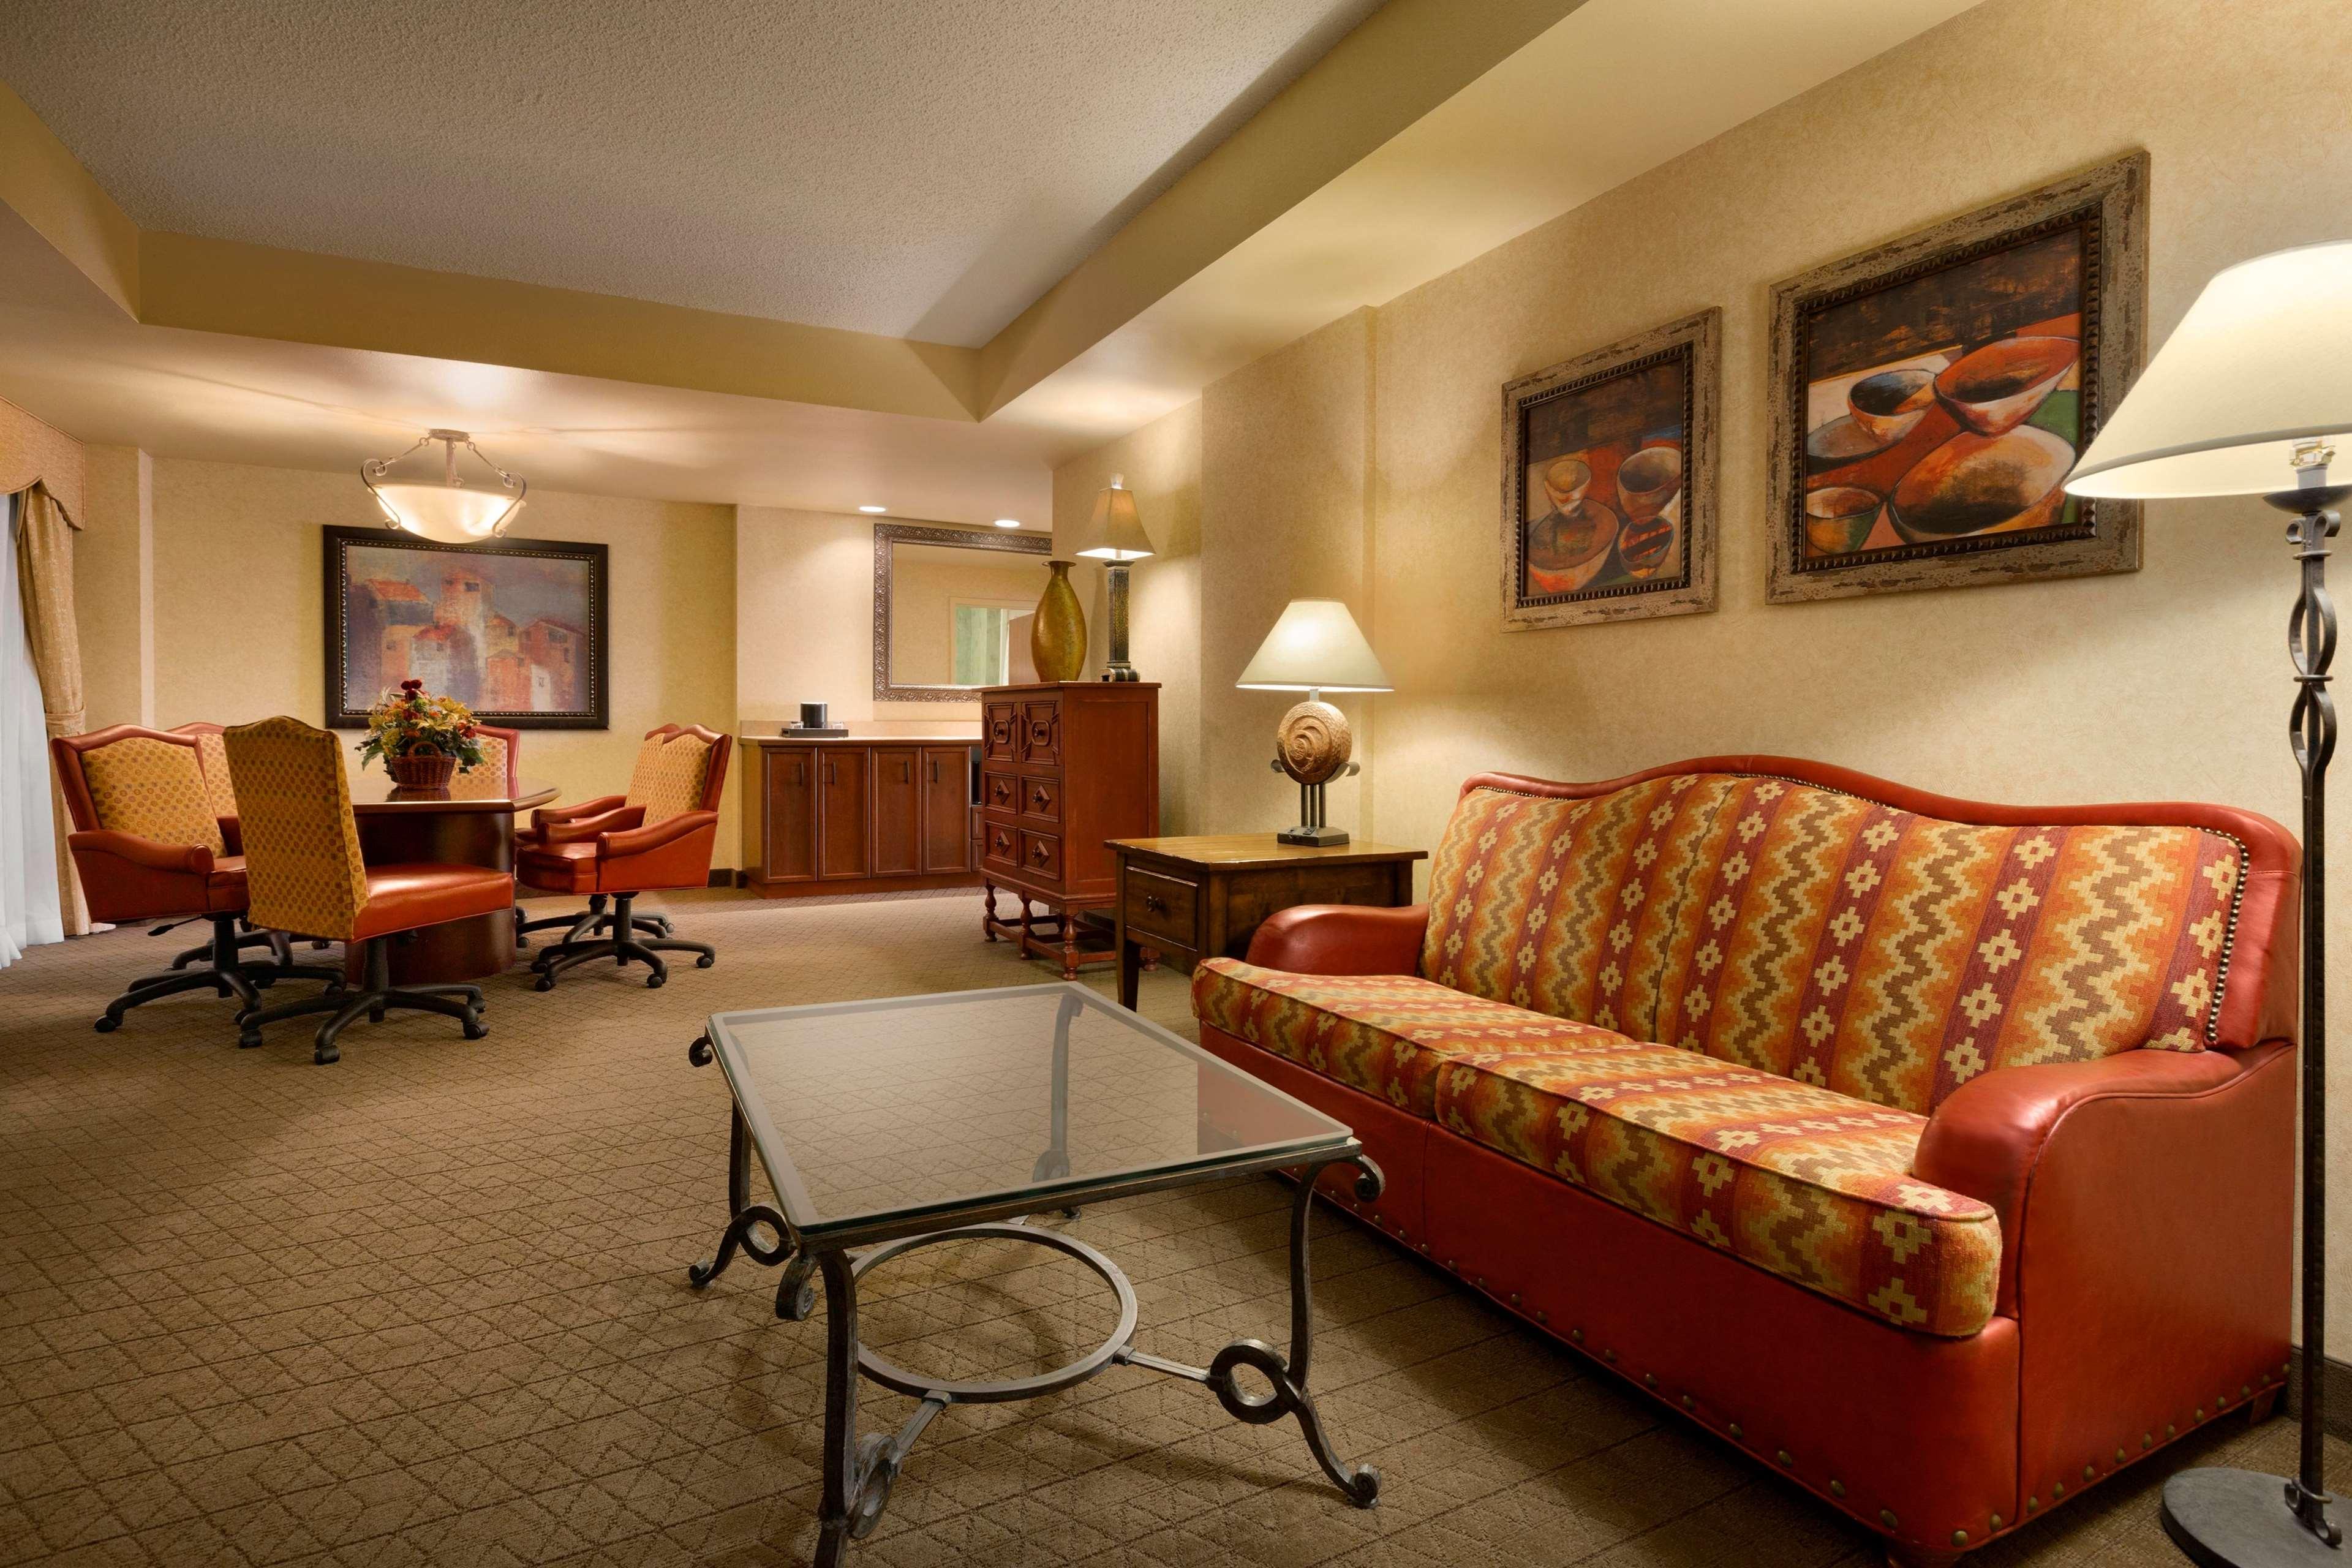 Embassy Suites by Hilton Albuquerque Hotel & Spa image 12